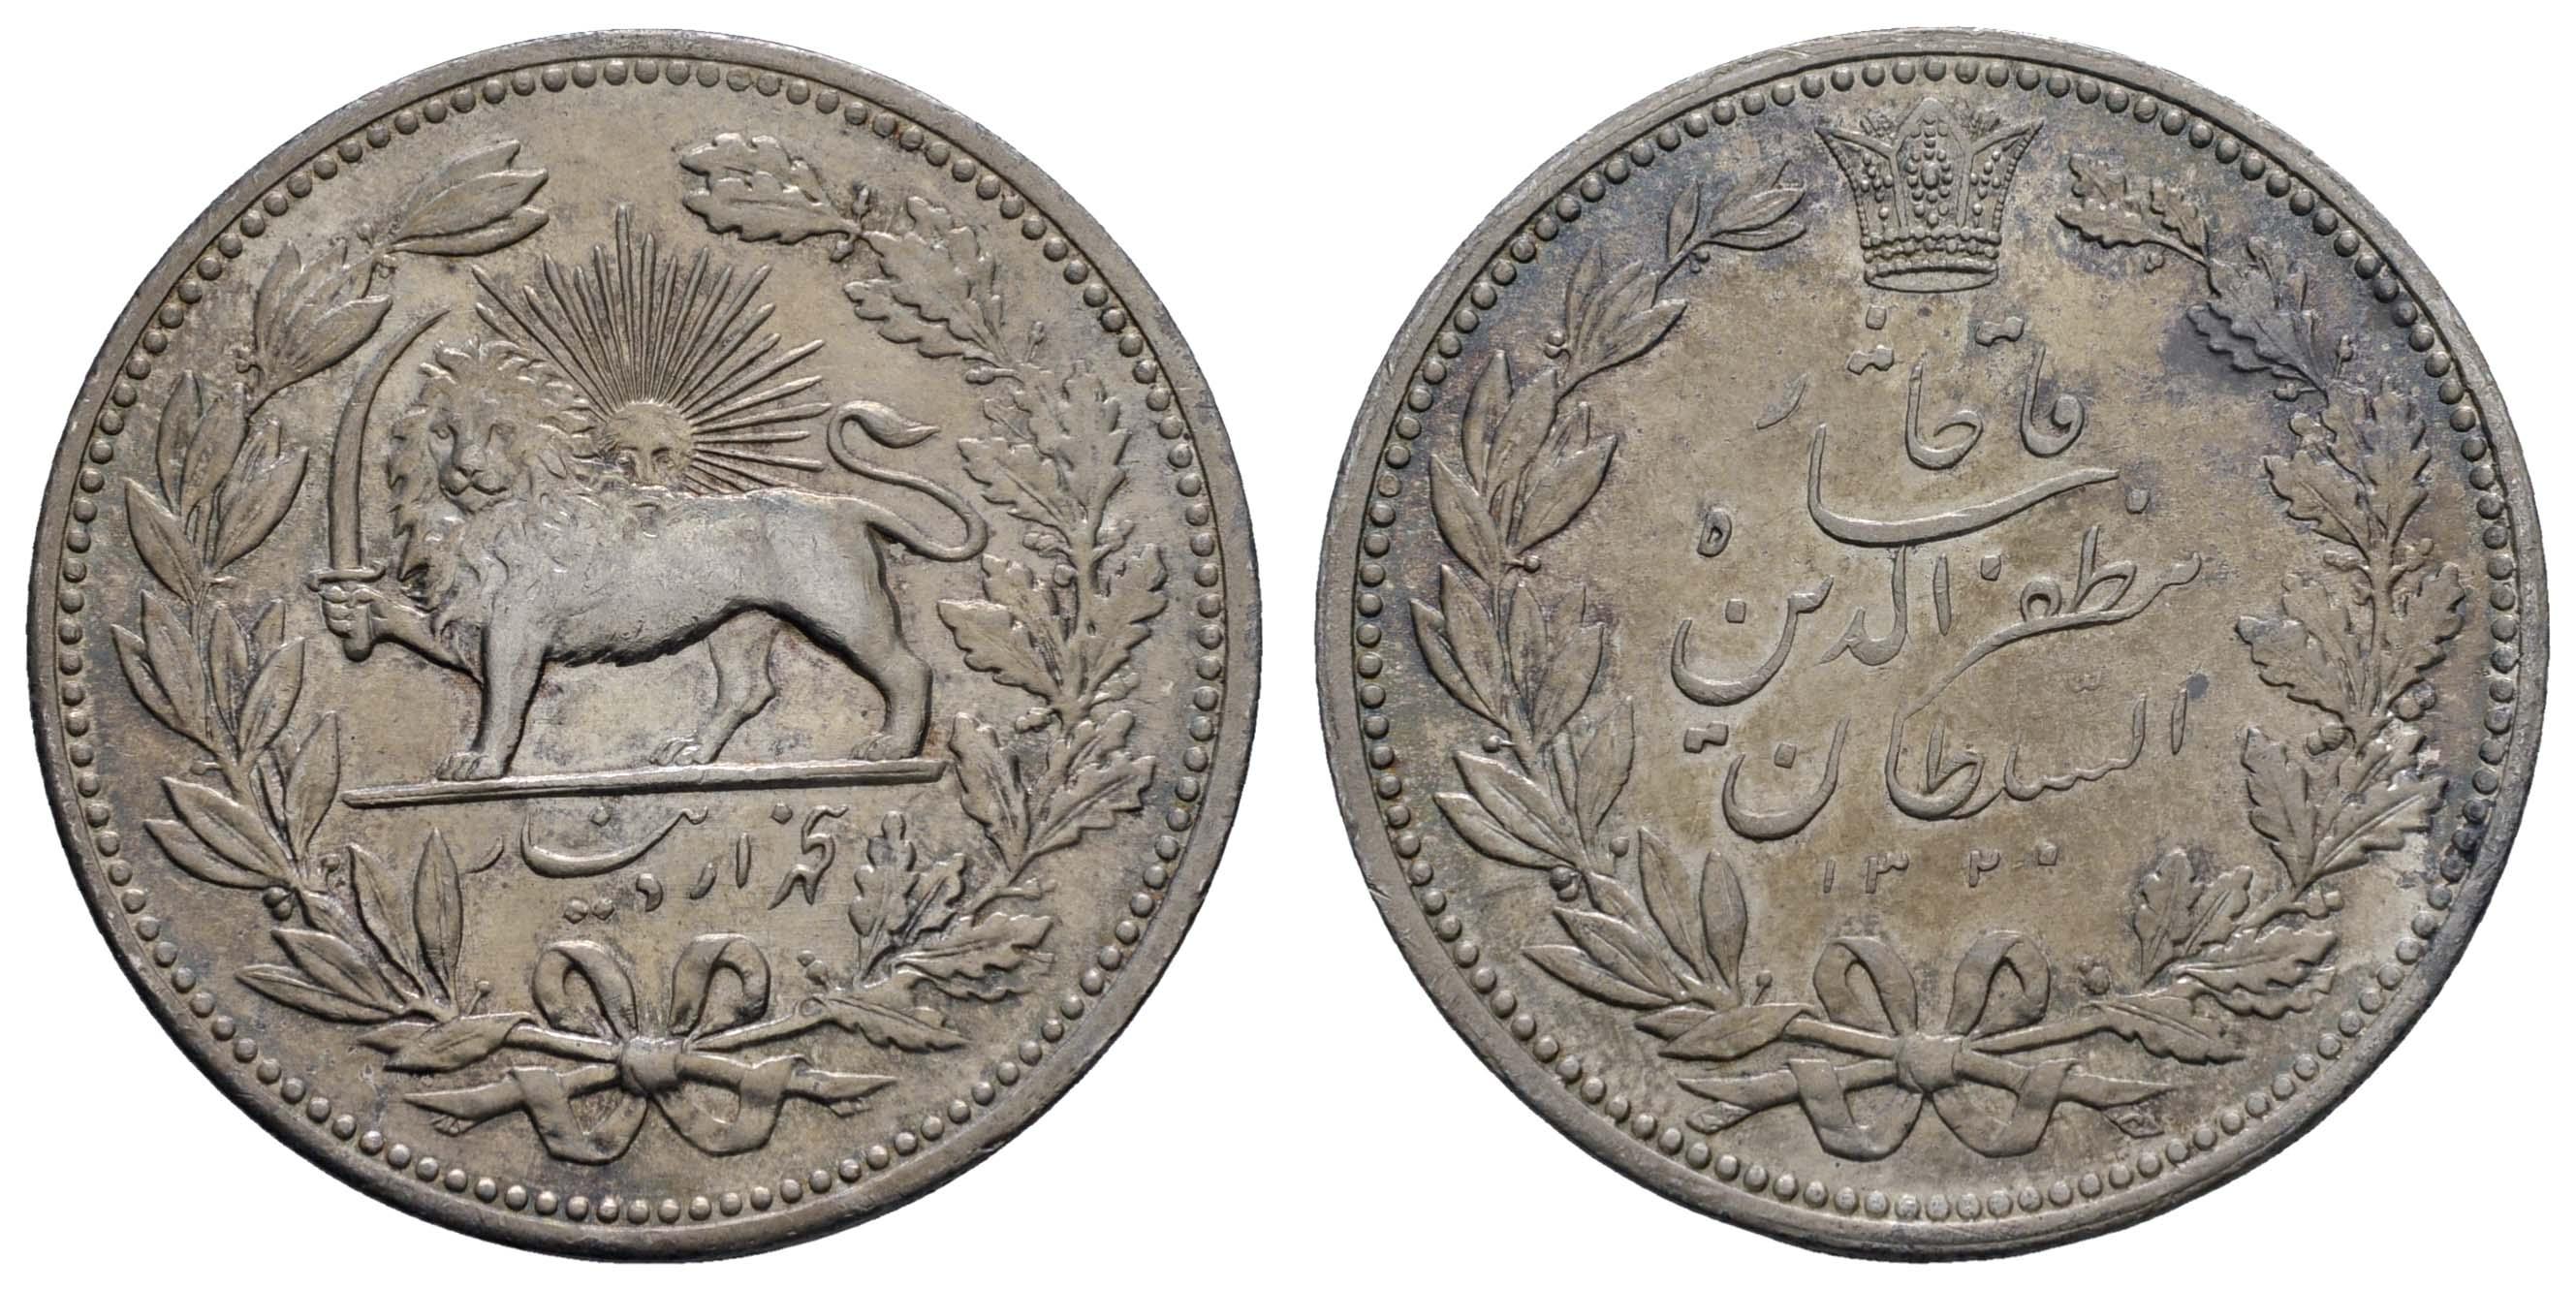 Lot 1973 - übersee iran -  Auktionshaus Ulrich Felzmann GmbH & Co. KG Coins single lots